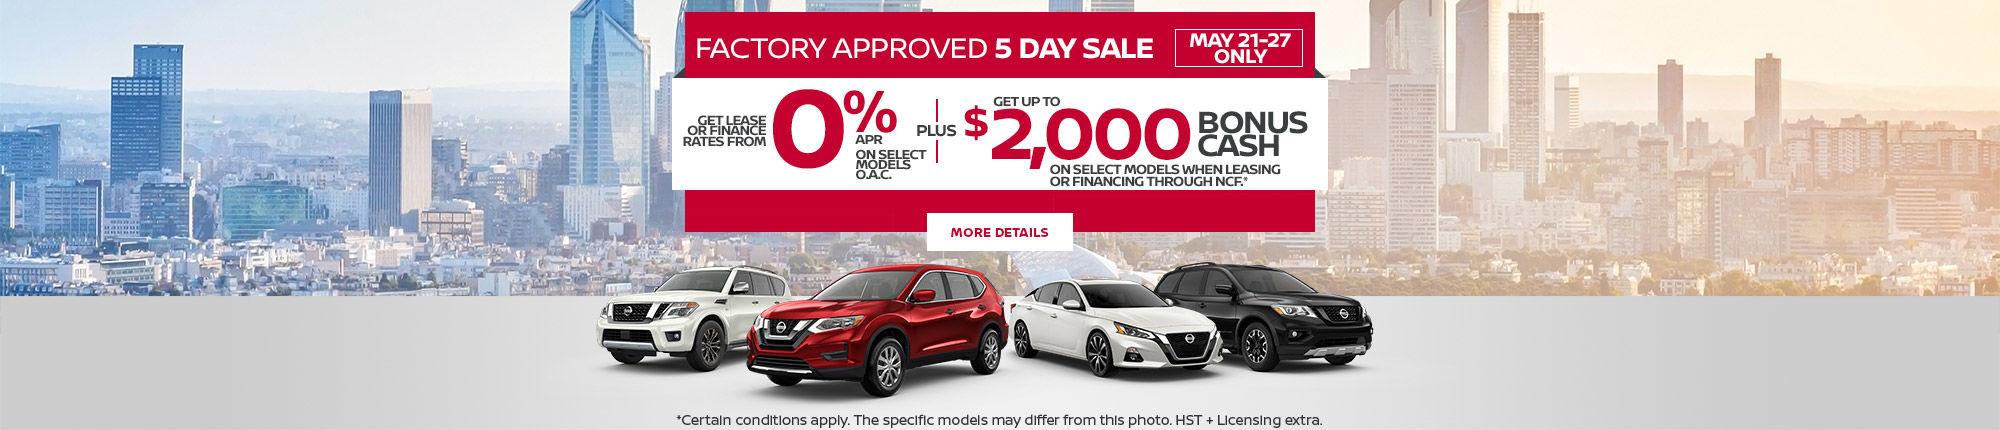 Nissan Event (5 days)